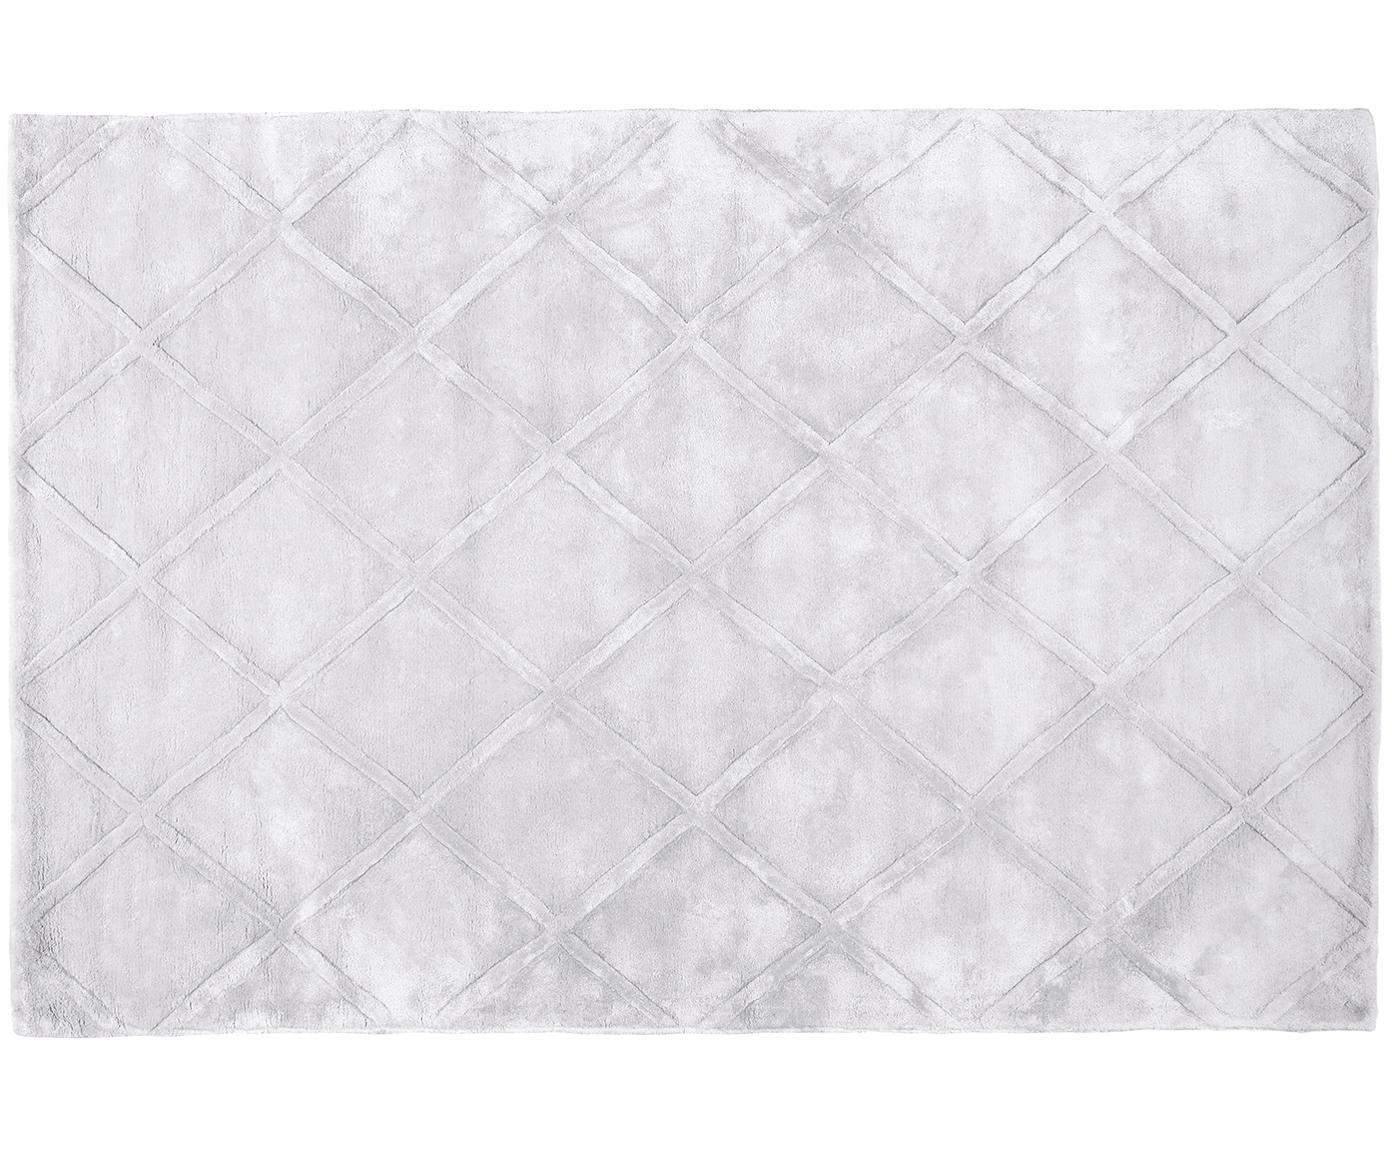 Alfombra artesanal de viscosa Madeleine, Parte superior: 100%viscosa, Reverso: 100%algodón, Gris plateado claro, An 120 x L 180 cm (Tamaño S)